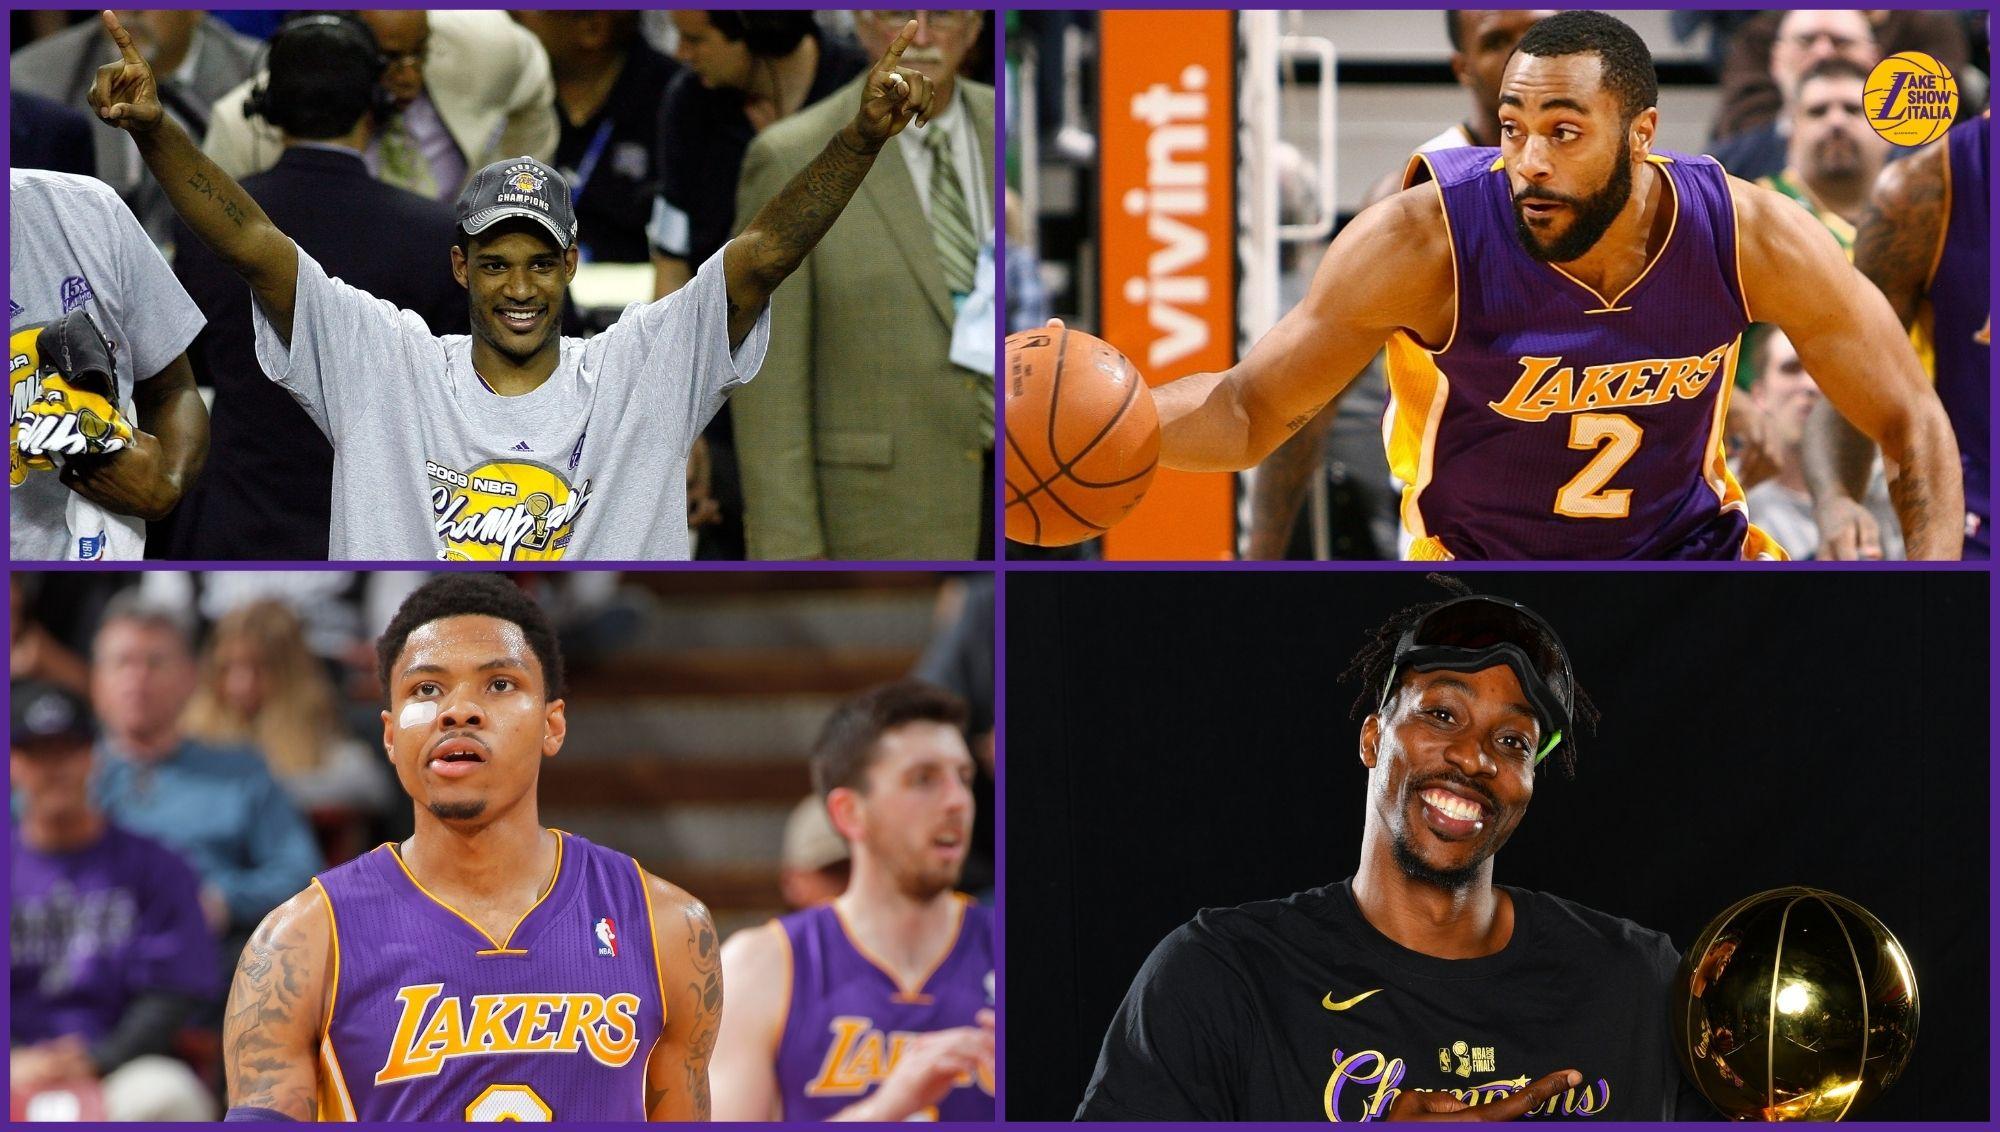 Reunion Night per i Lakers, che riportano a Los Angeles i veterani Trevor Ariza, Kent Bazemore, Wayne Ellington e Dwight Howard.